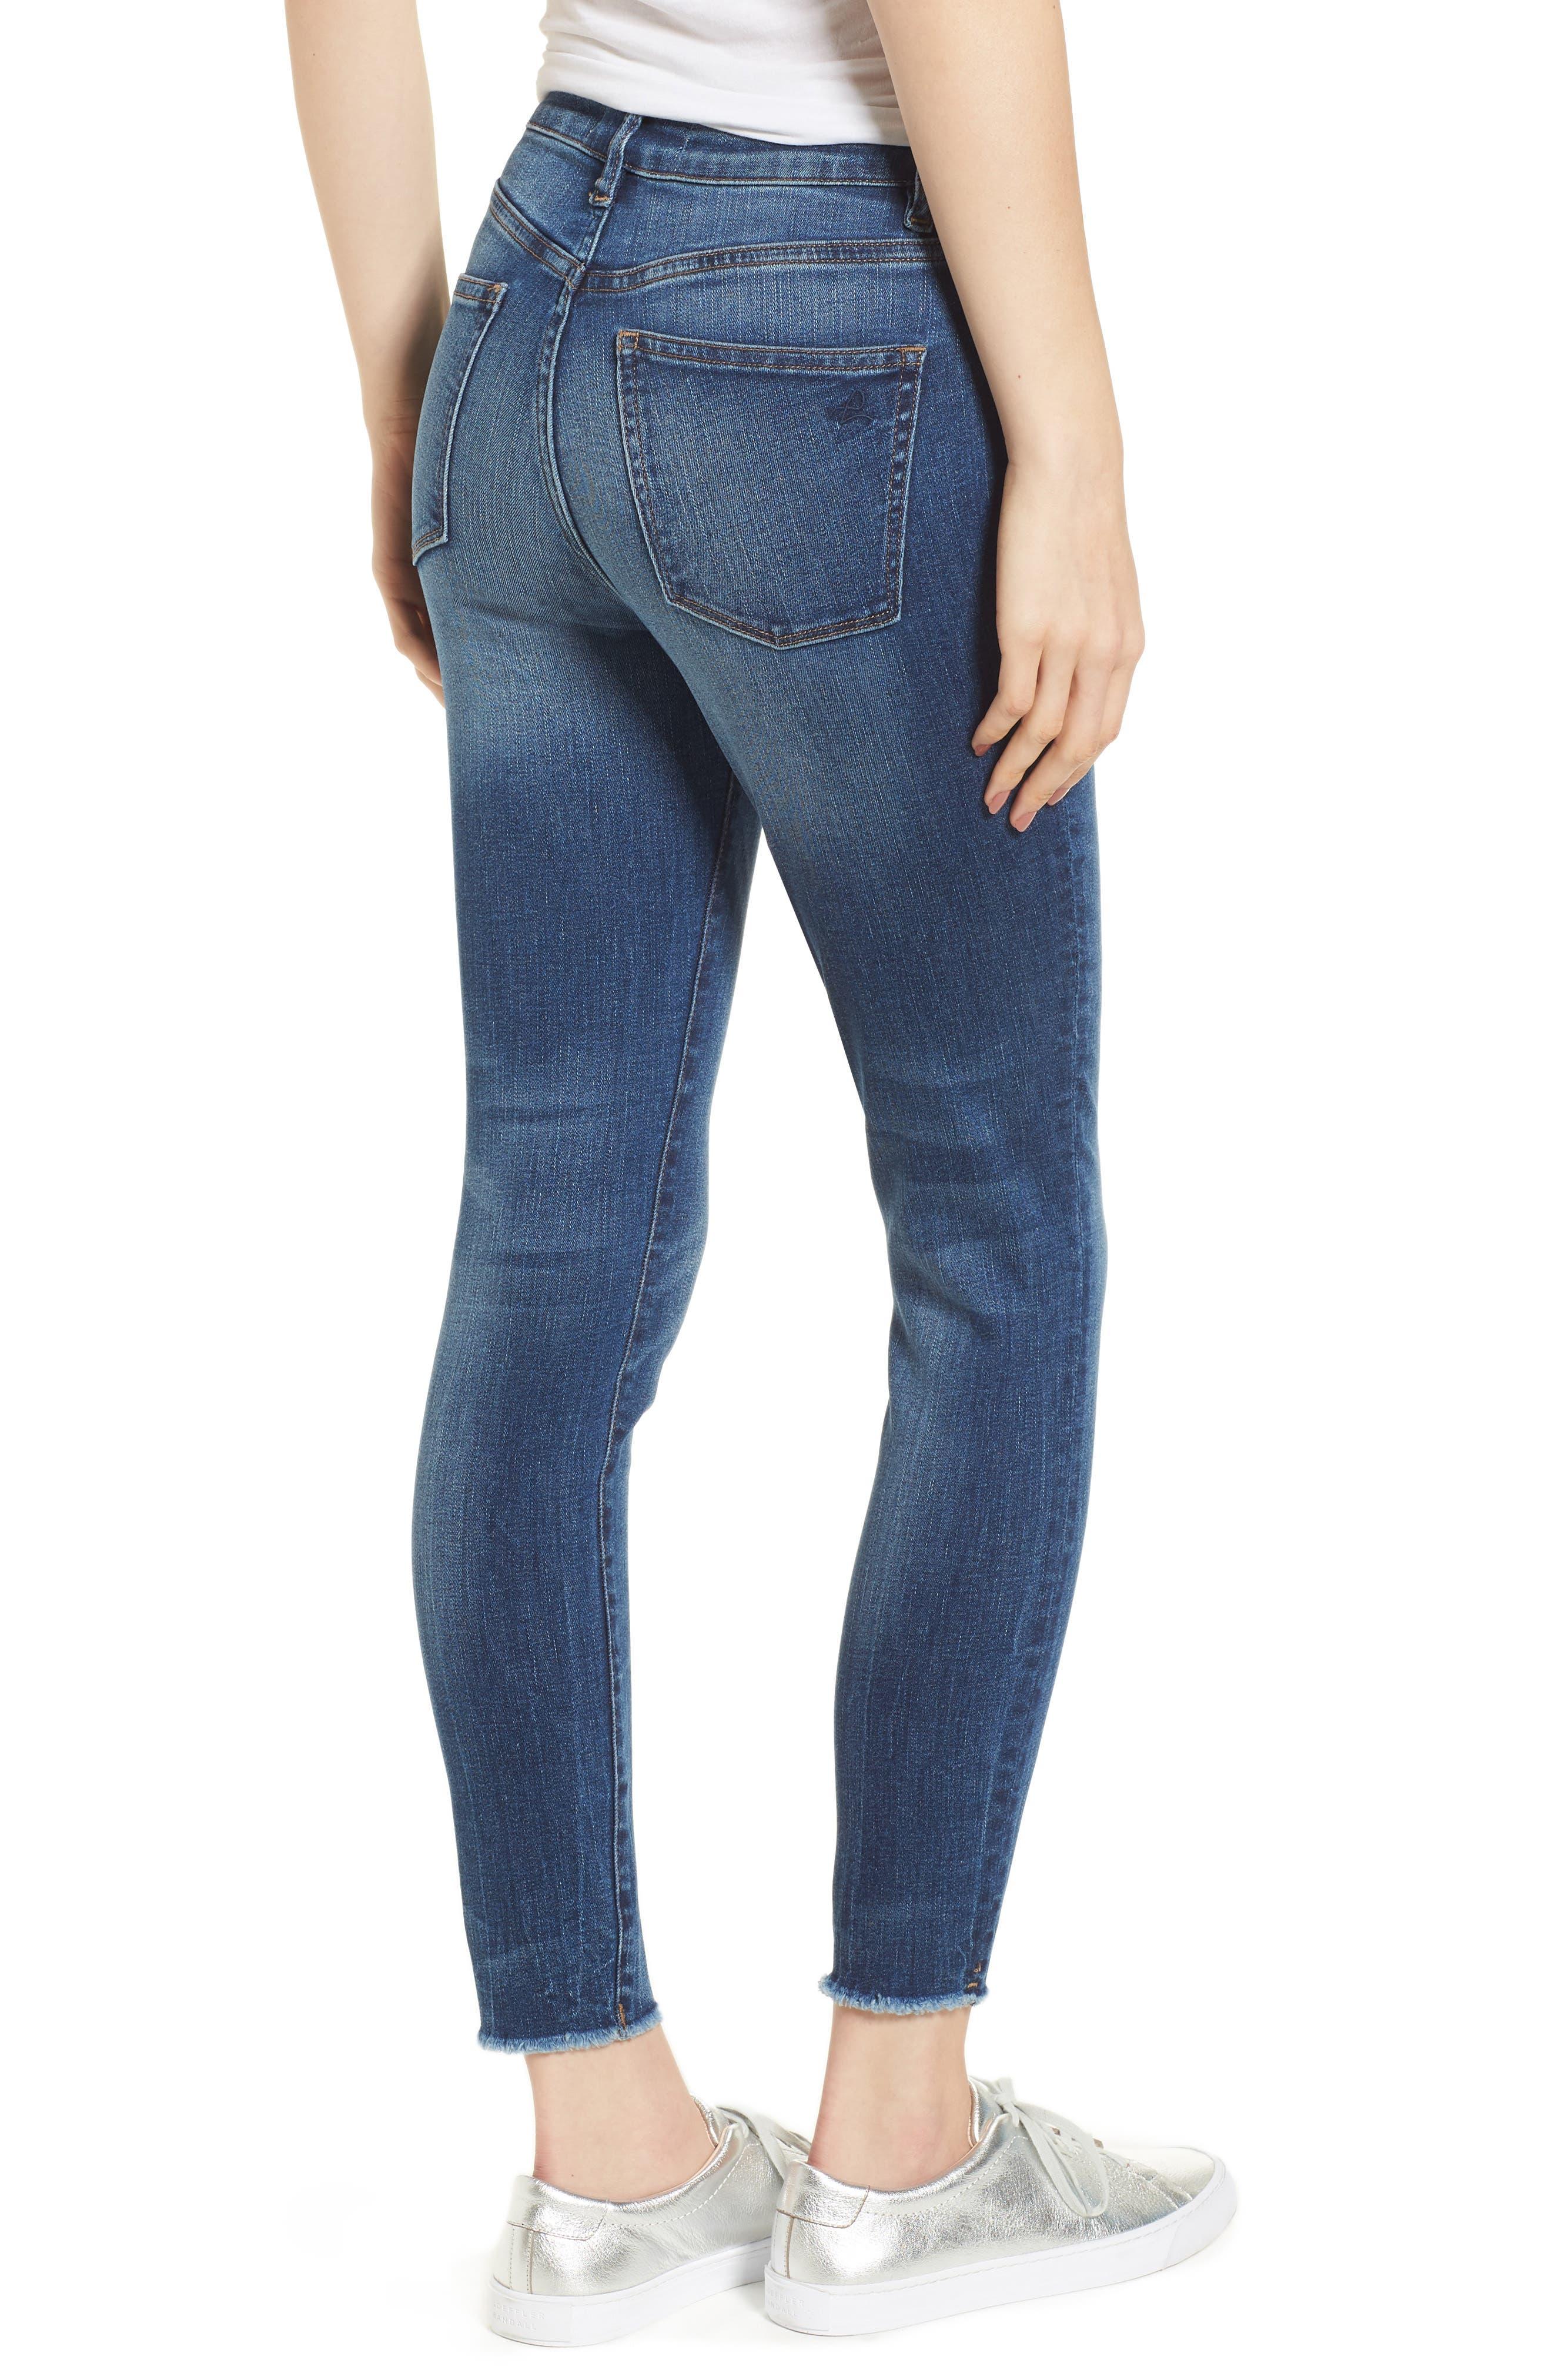 Chrissy Trimtone High Waist Skinny Jeans,                             Alternate thumbnail 2, color,                             425